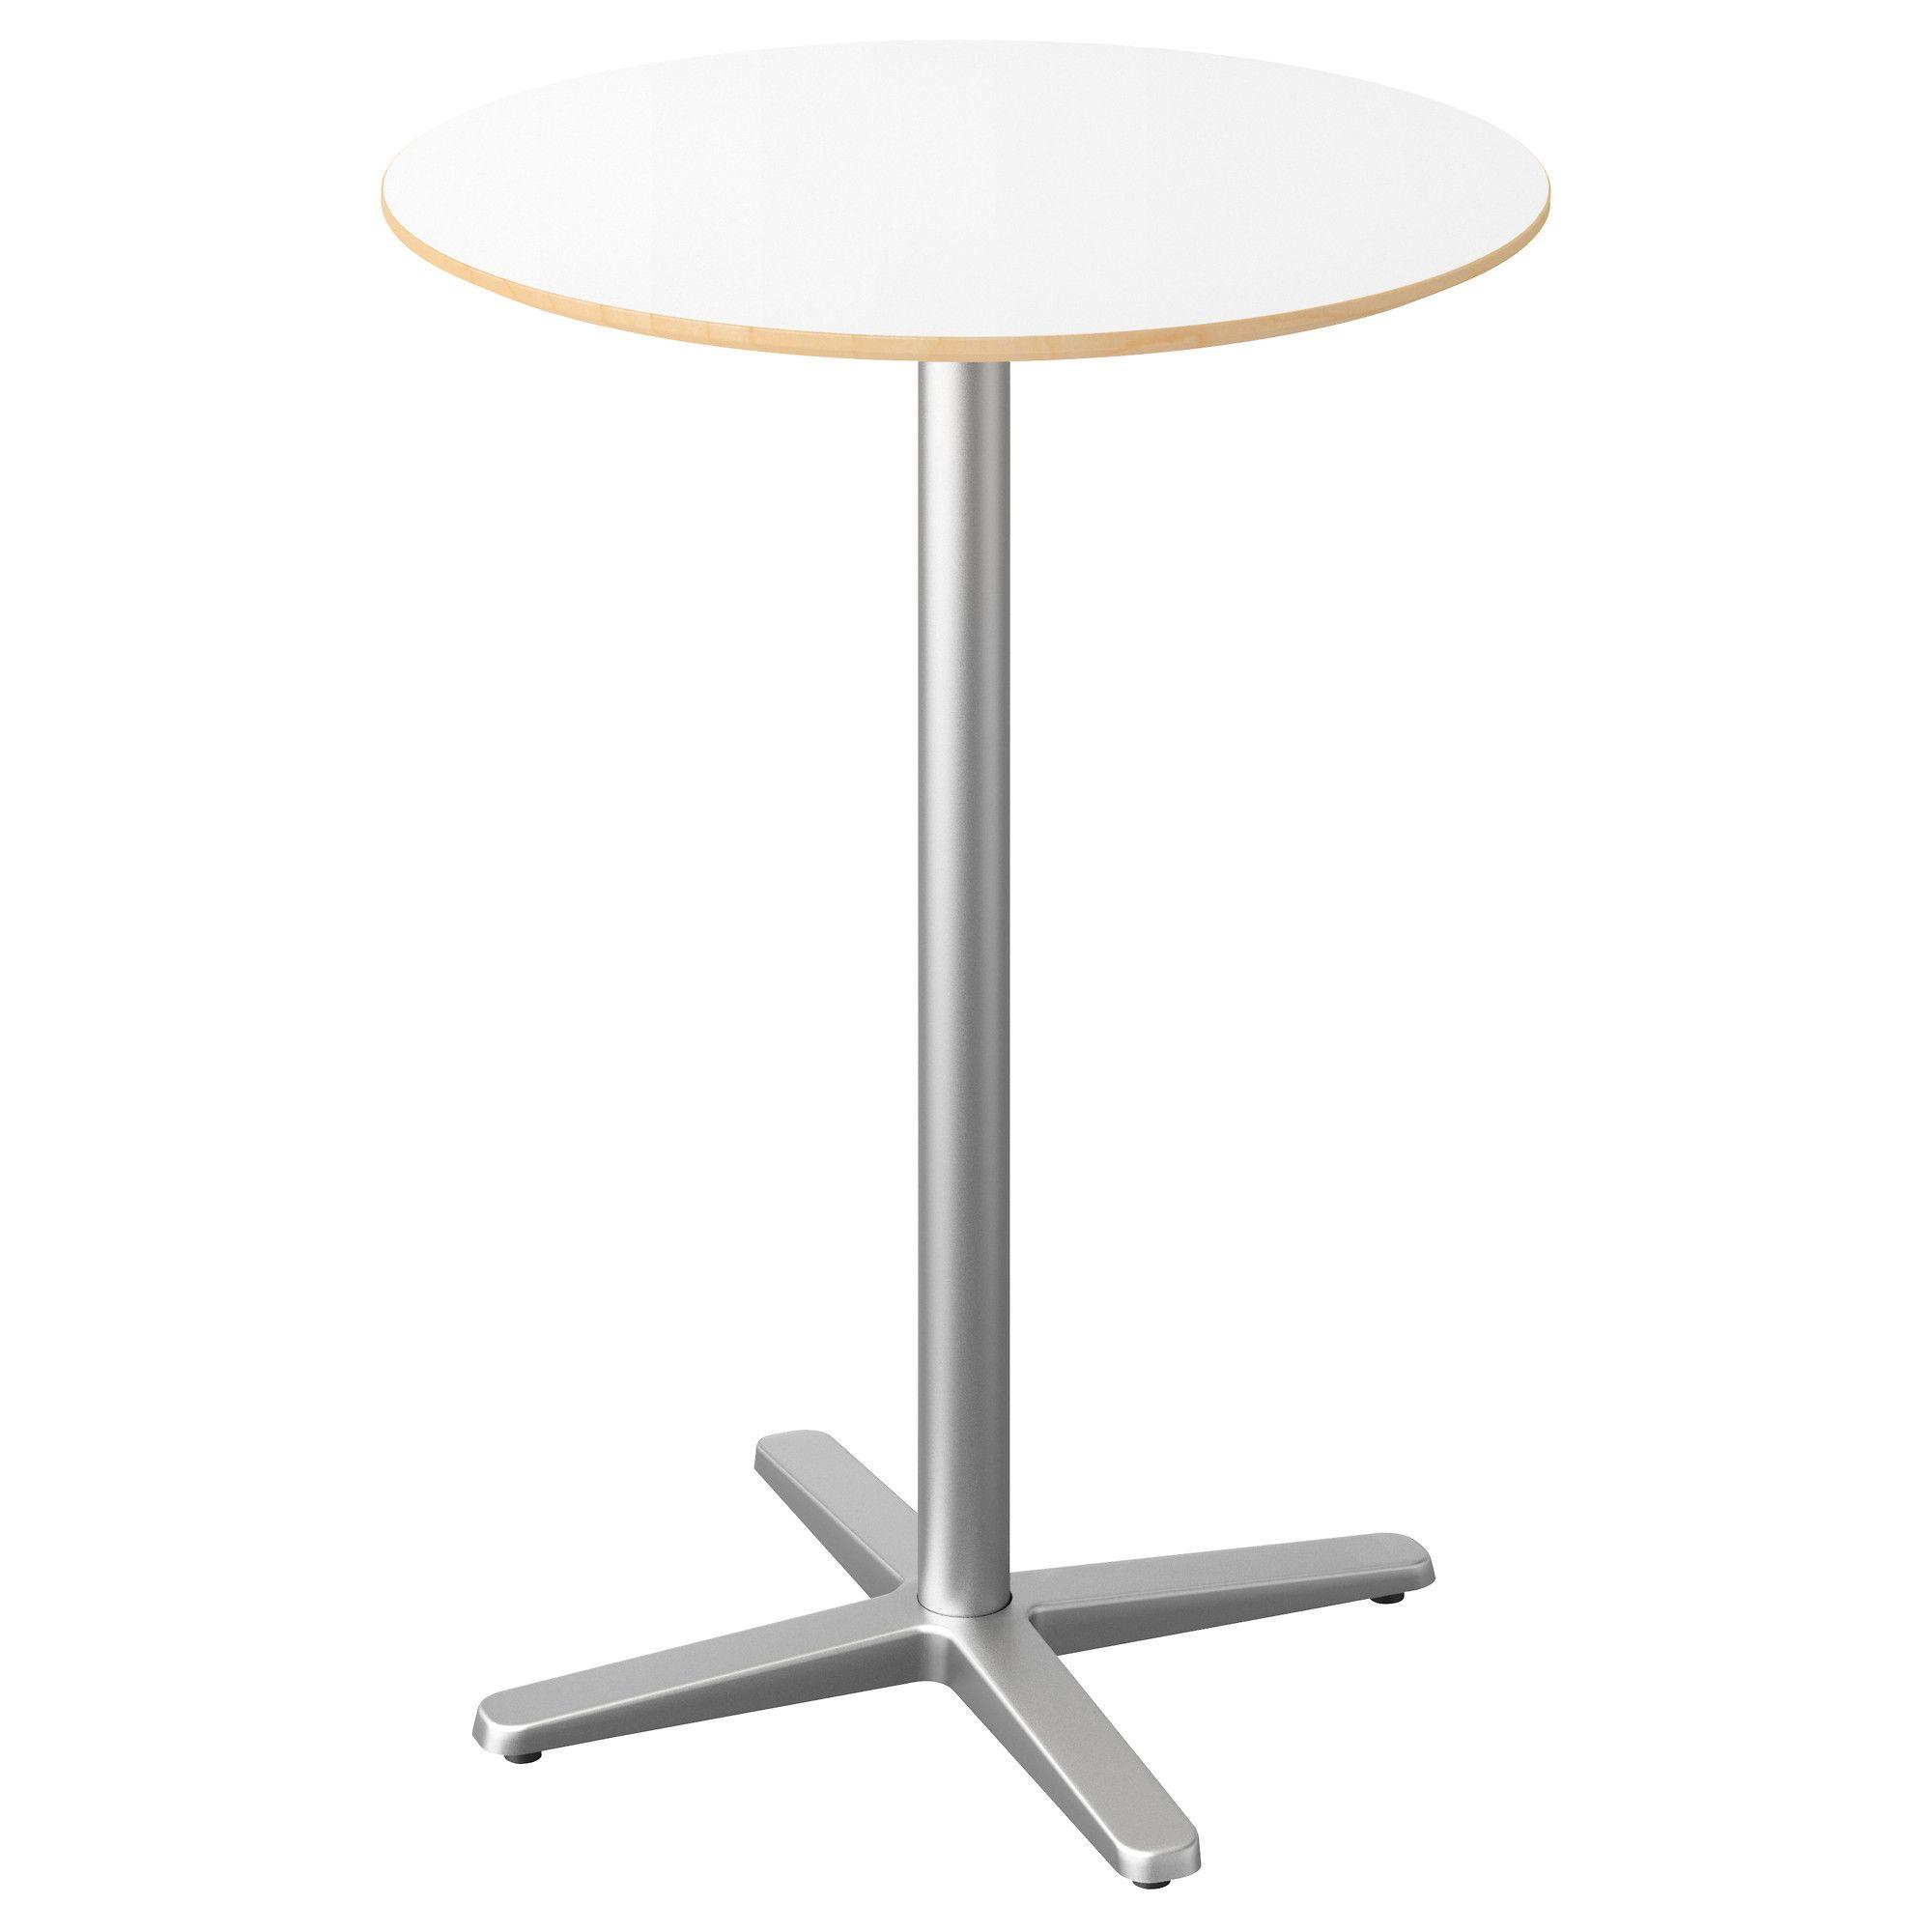 Ikea Us Furniture And Home Furnishings Bar Table Ikea Ikea Table Tops Bar Table